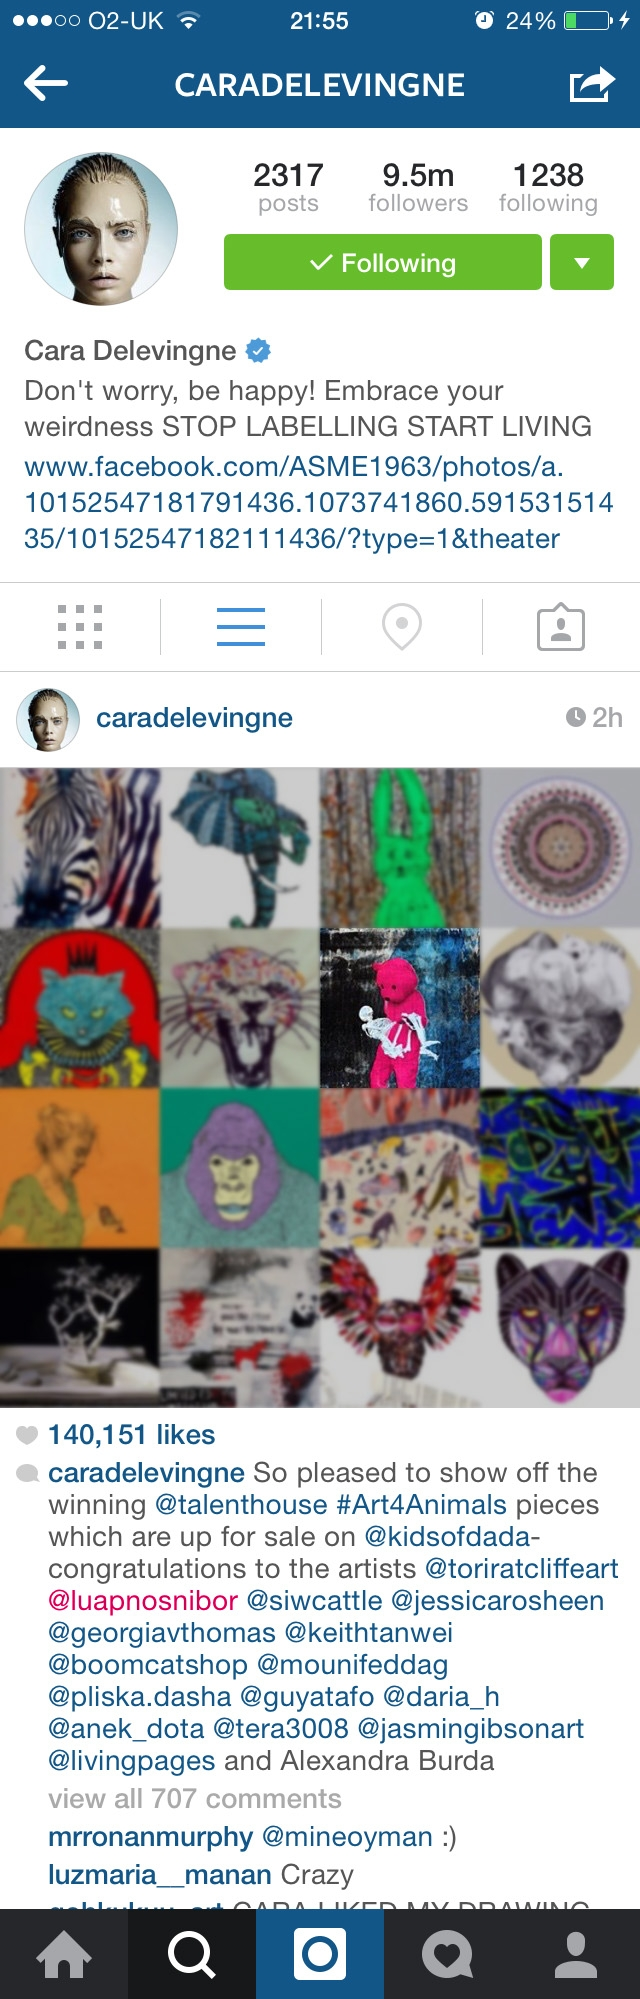 Cara Delevingne's instagram for #Art4Animals